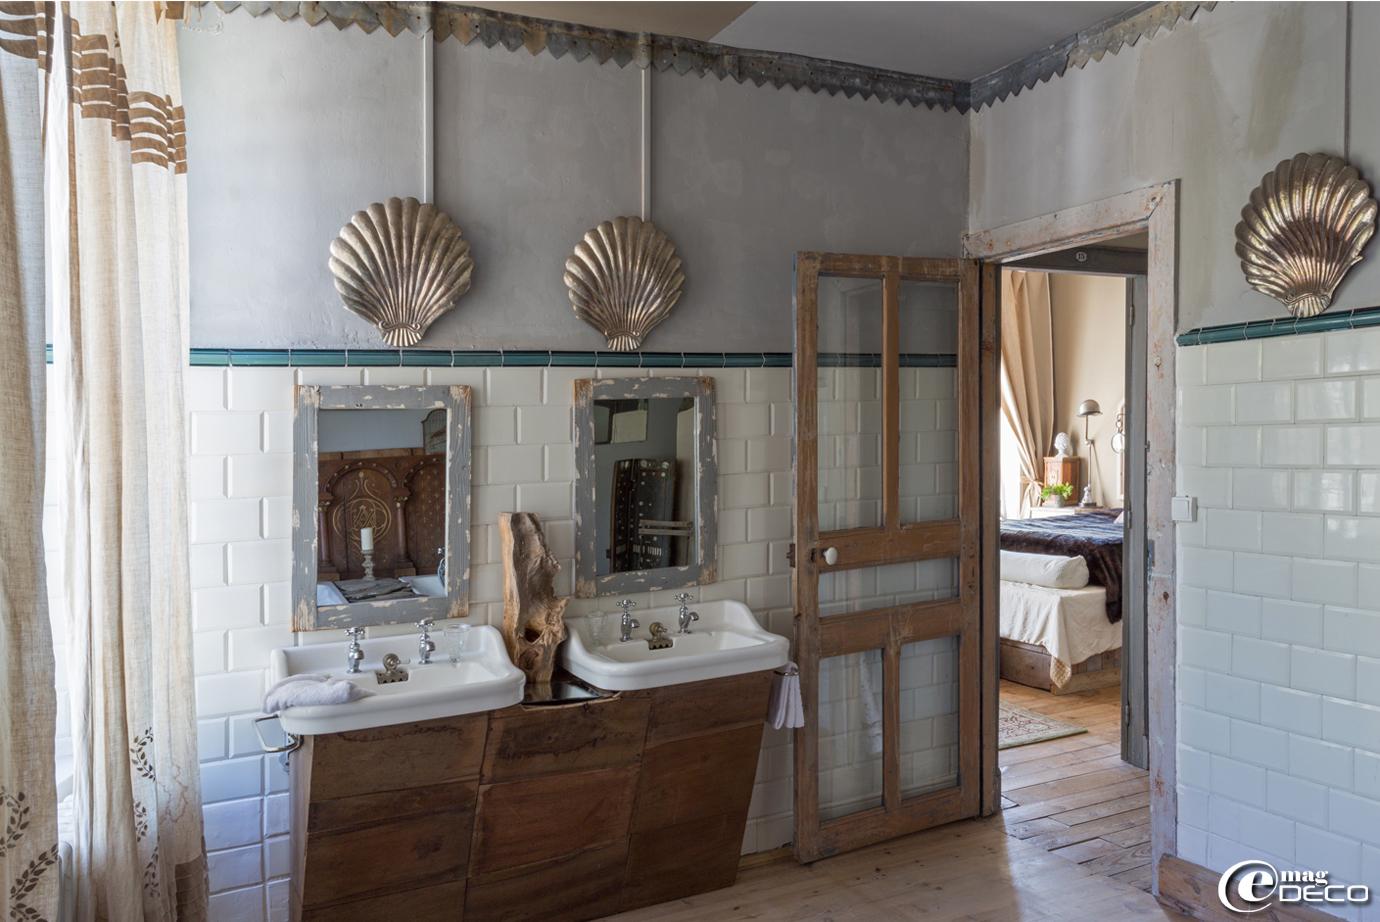 echelle salle de bain alinea. Black Bedroom Furniture Sets. Home Design Ideas